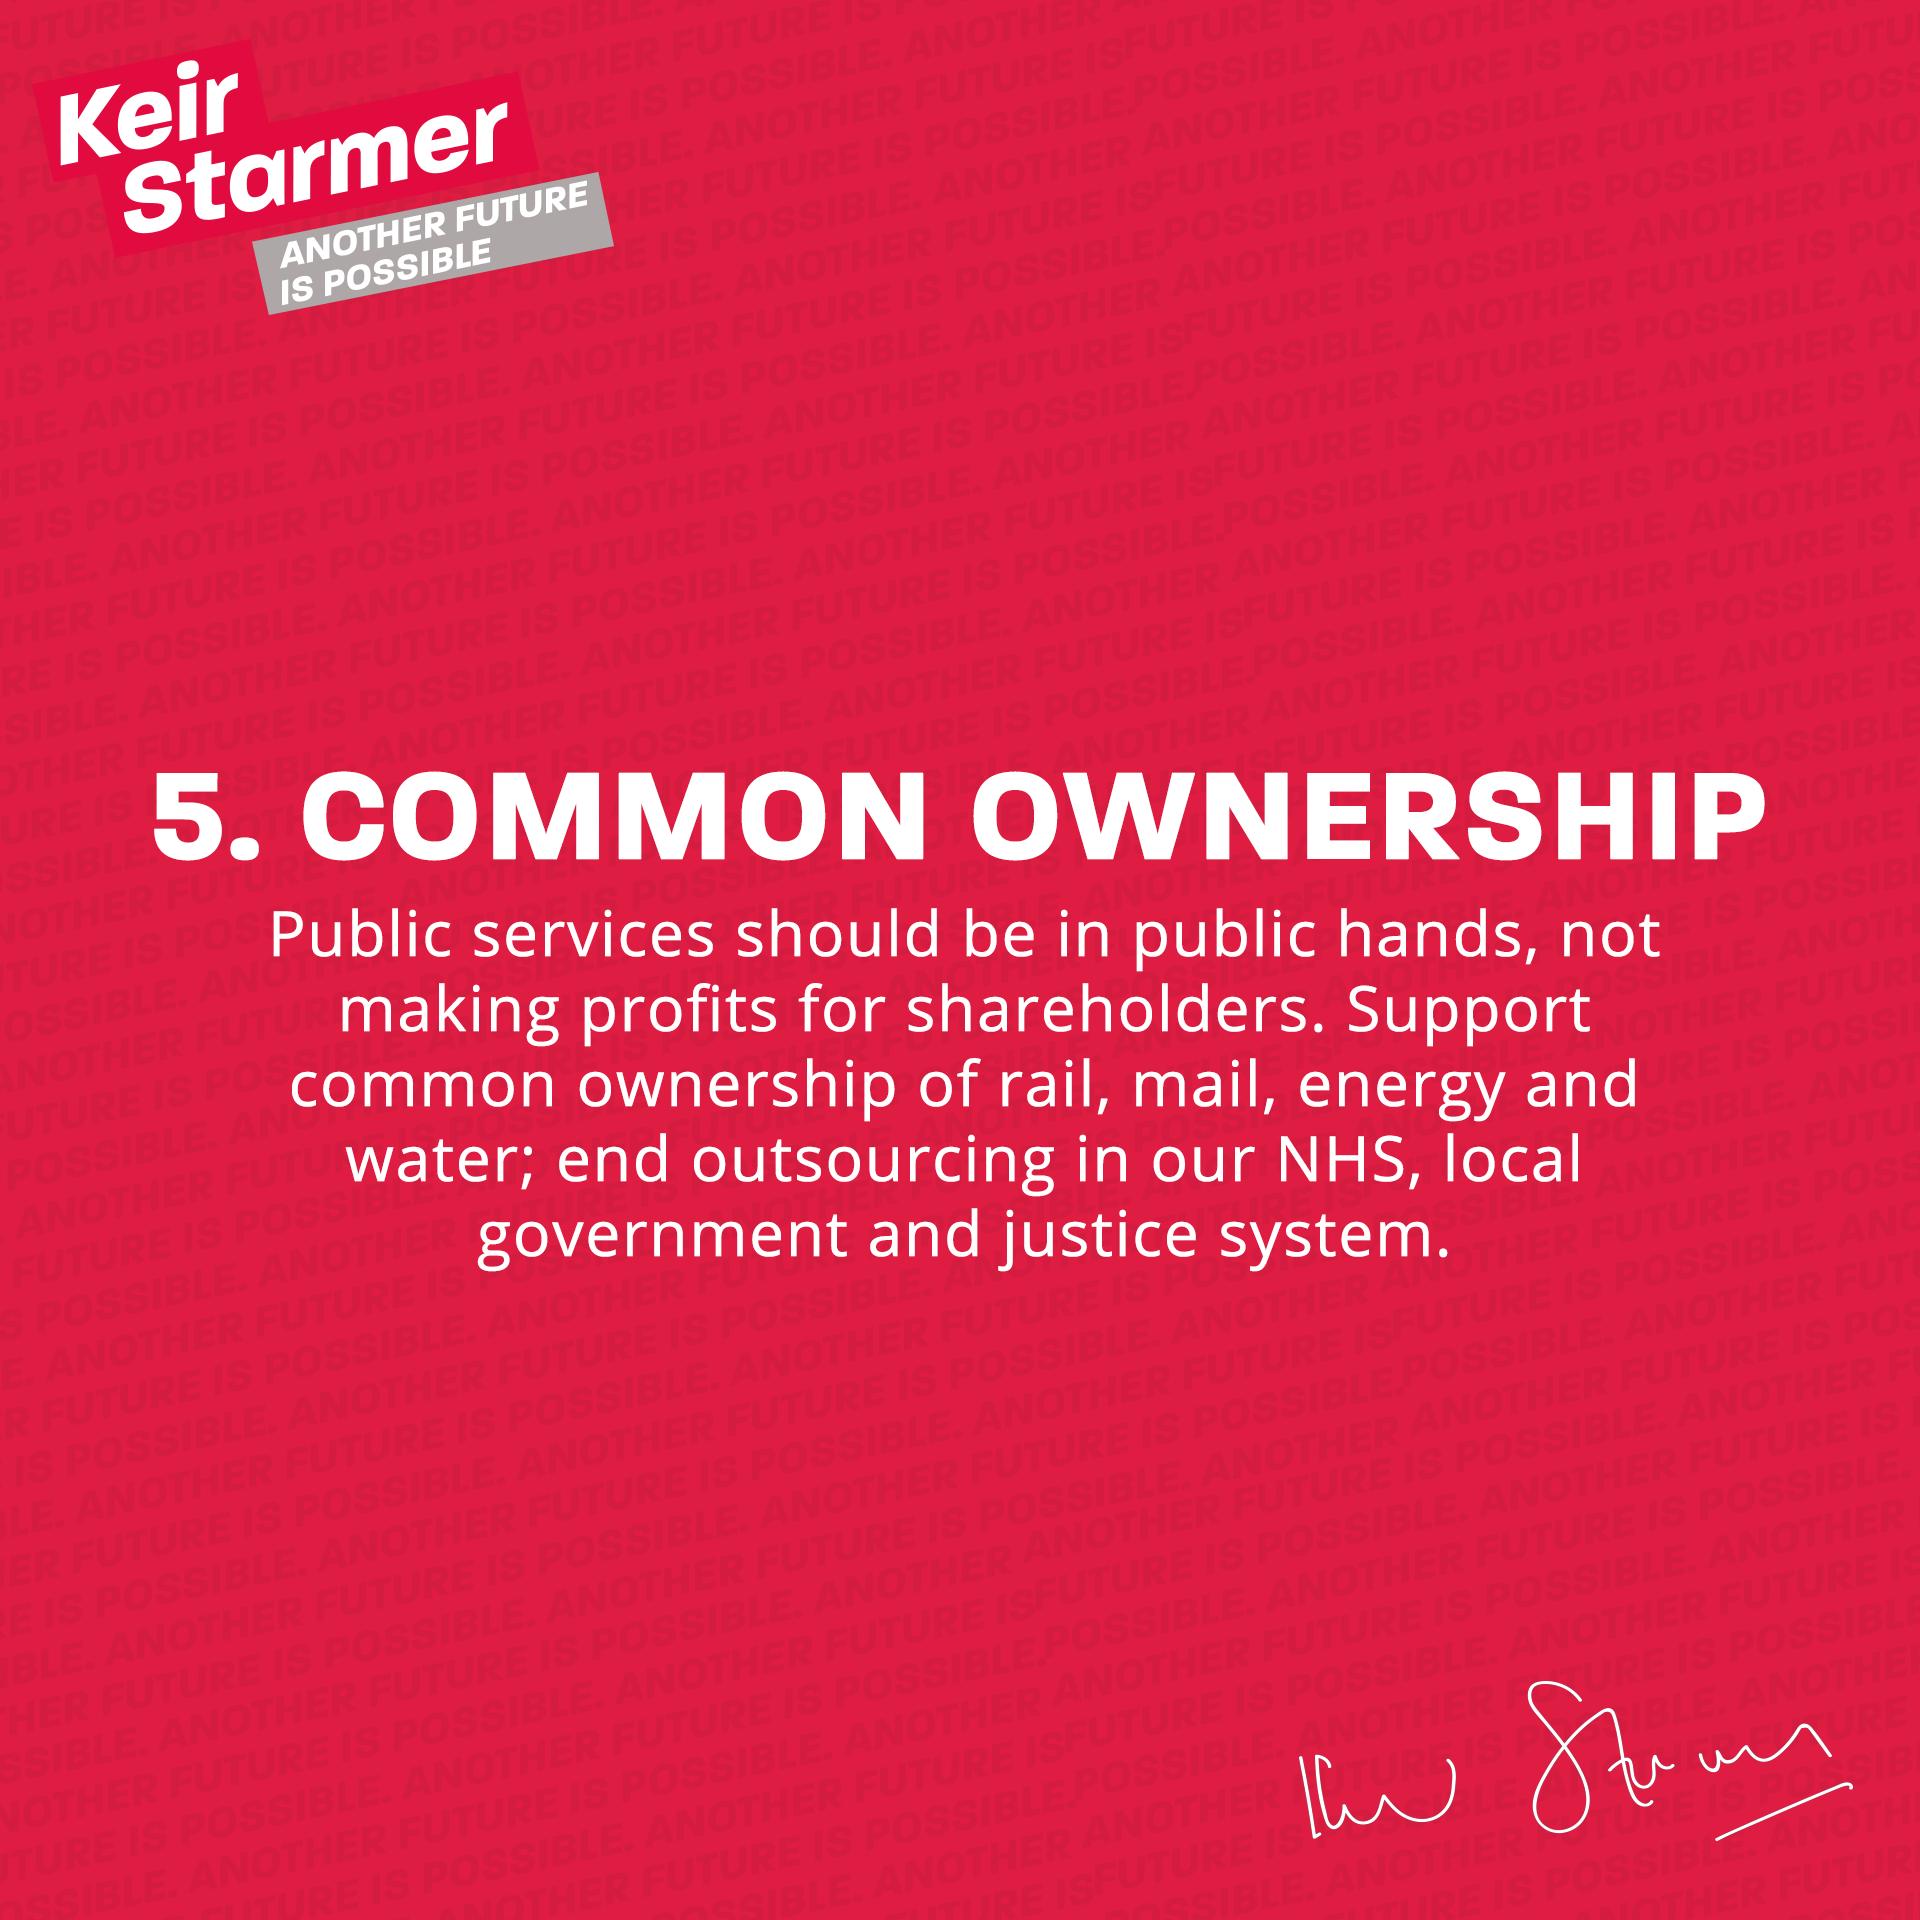 Keir Starmer - 5 Common Ownership - Leadership Pledge Graphic